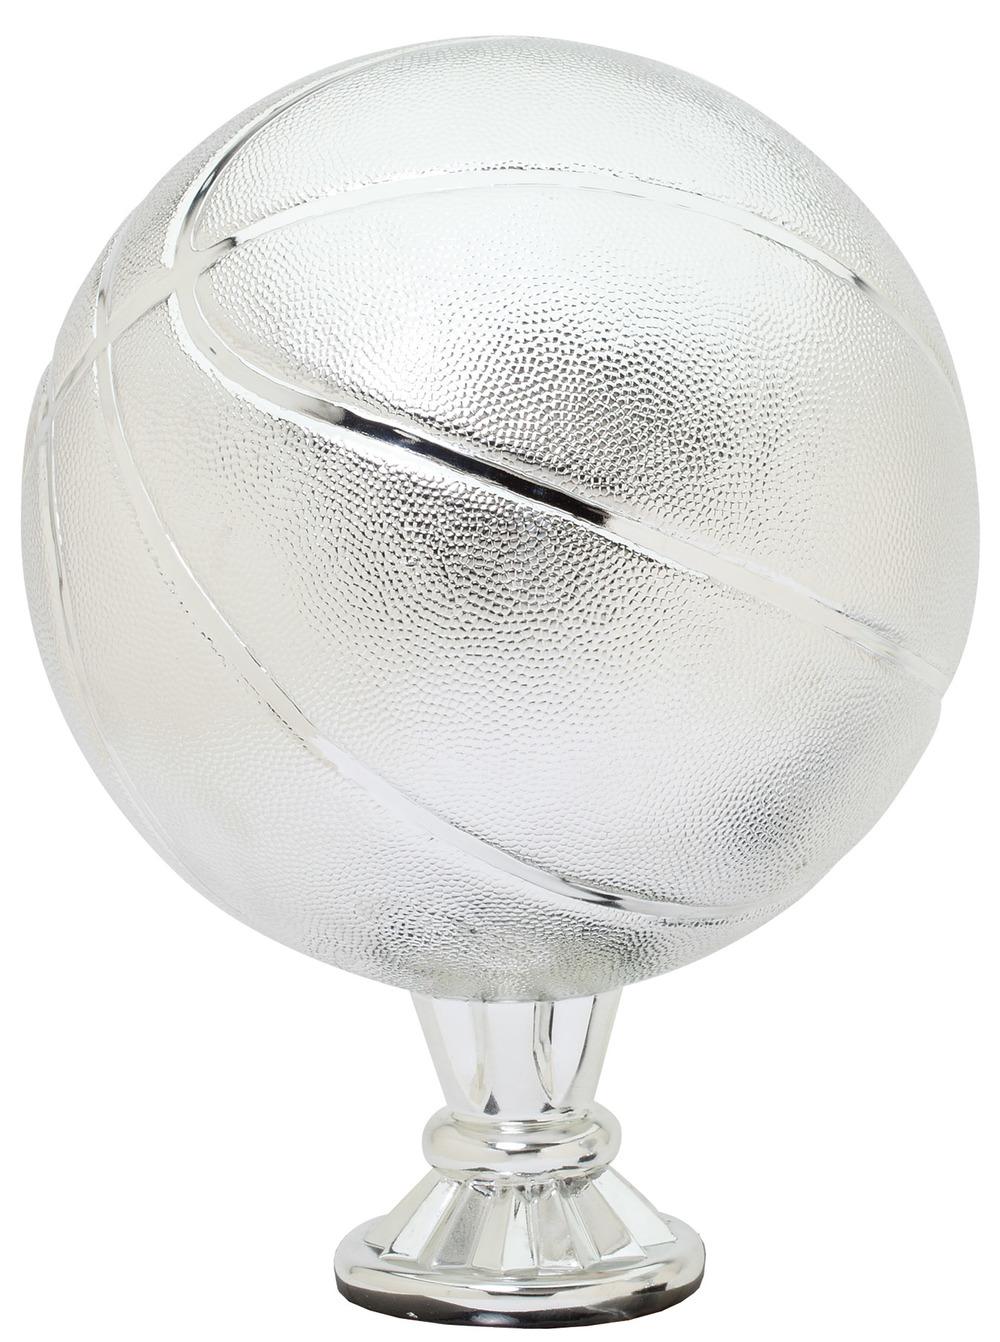 "Basketball - Silver   RG3203 - 11.5"" tall  Price = $109"